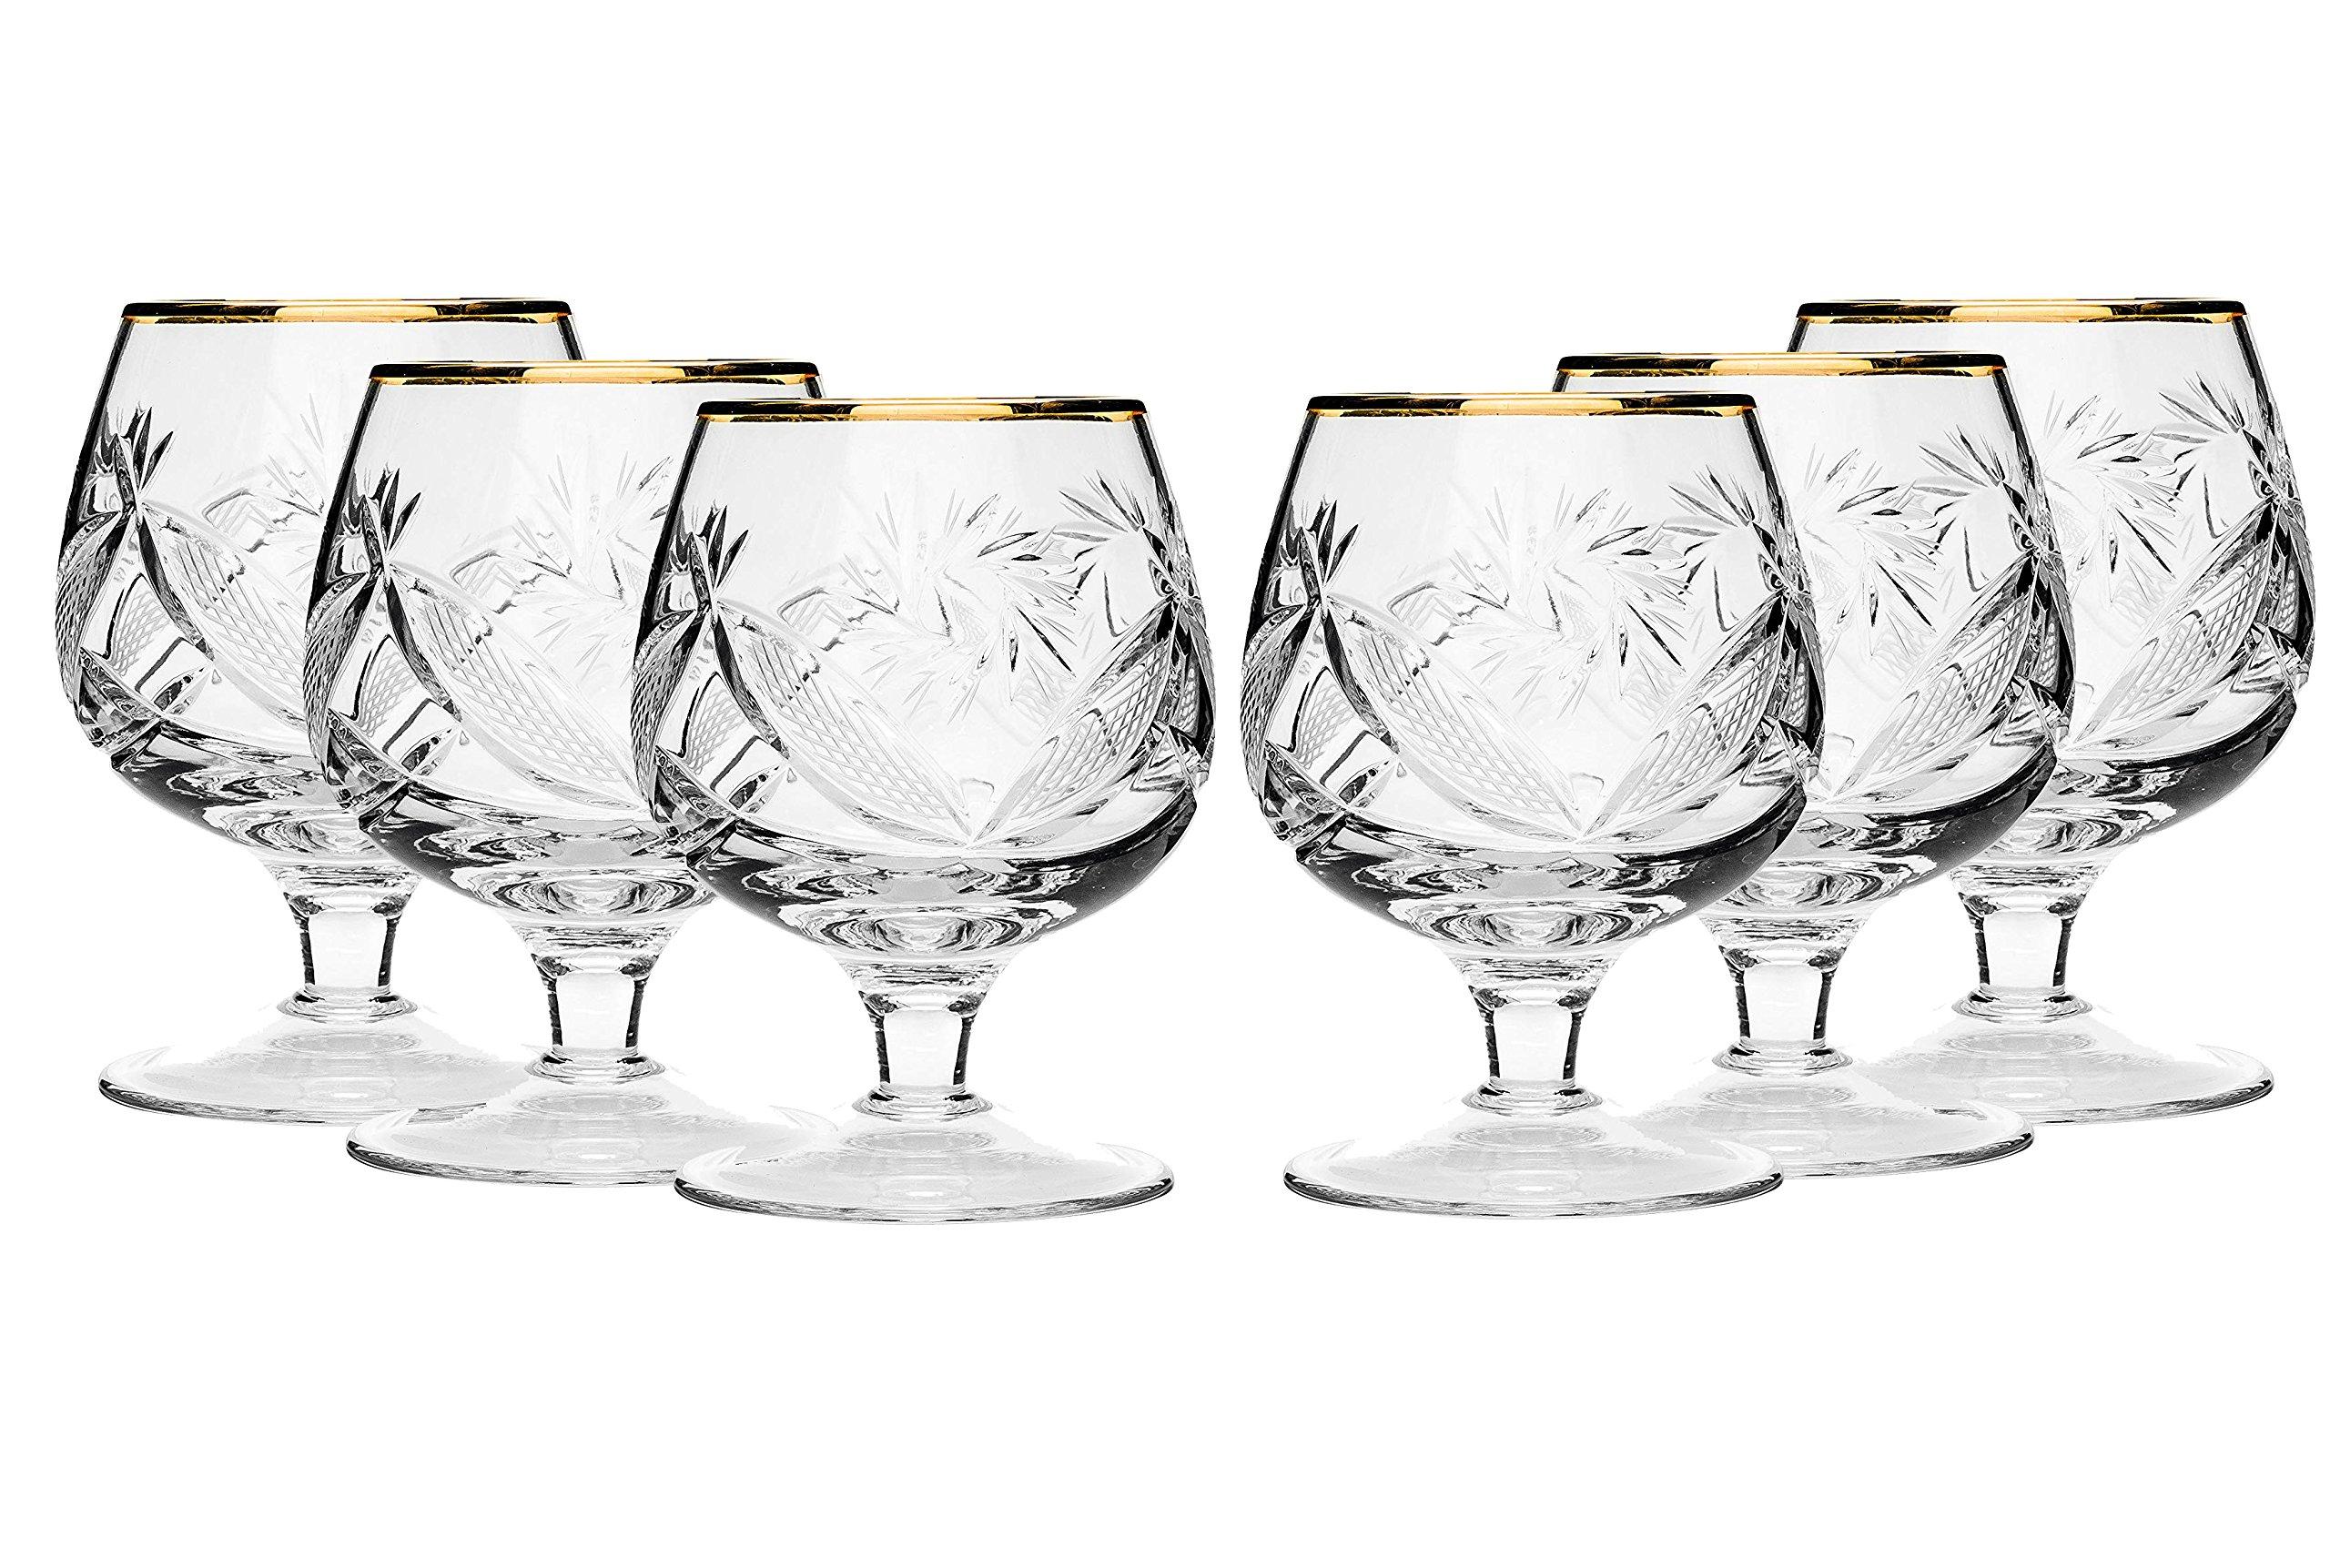 SET of 6 Russian Cut Crystal Cognac Scotch Whiskey Stemmed Snifter Goblet Glass 24K Gold Rimmed 7 Oz. Vodka Liquor Old-fashioned Glassware Hand Made